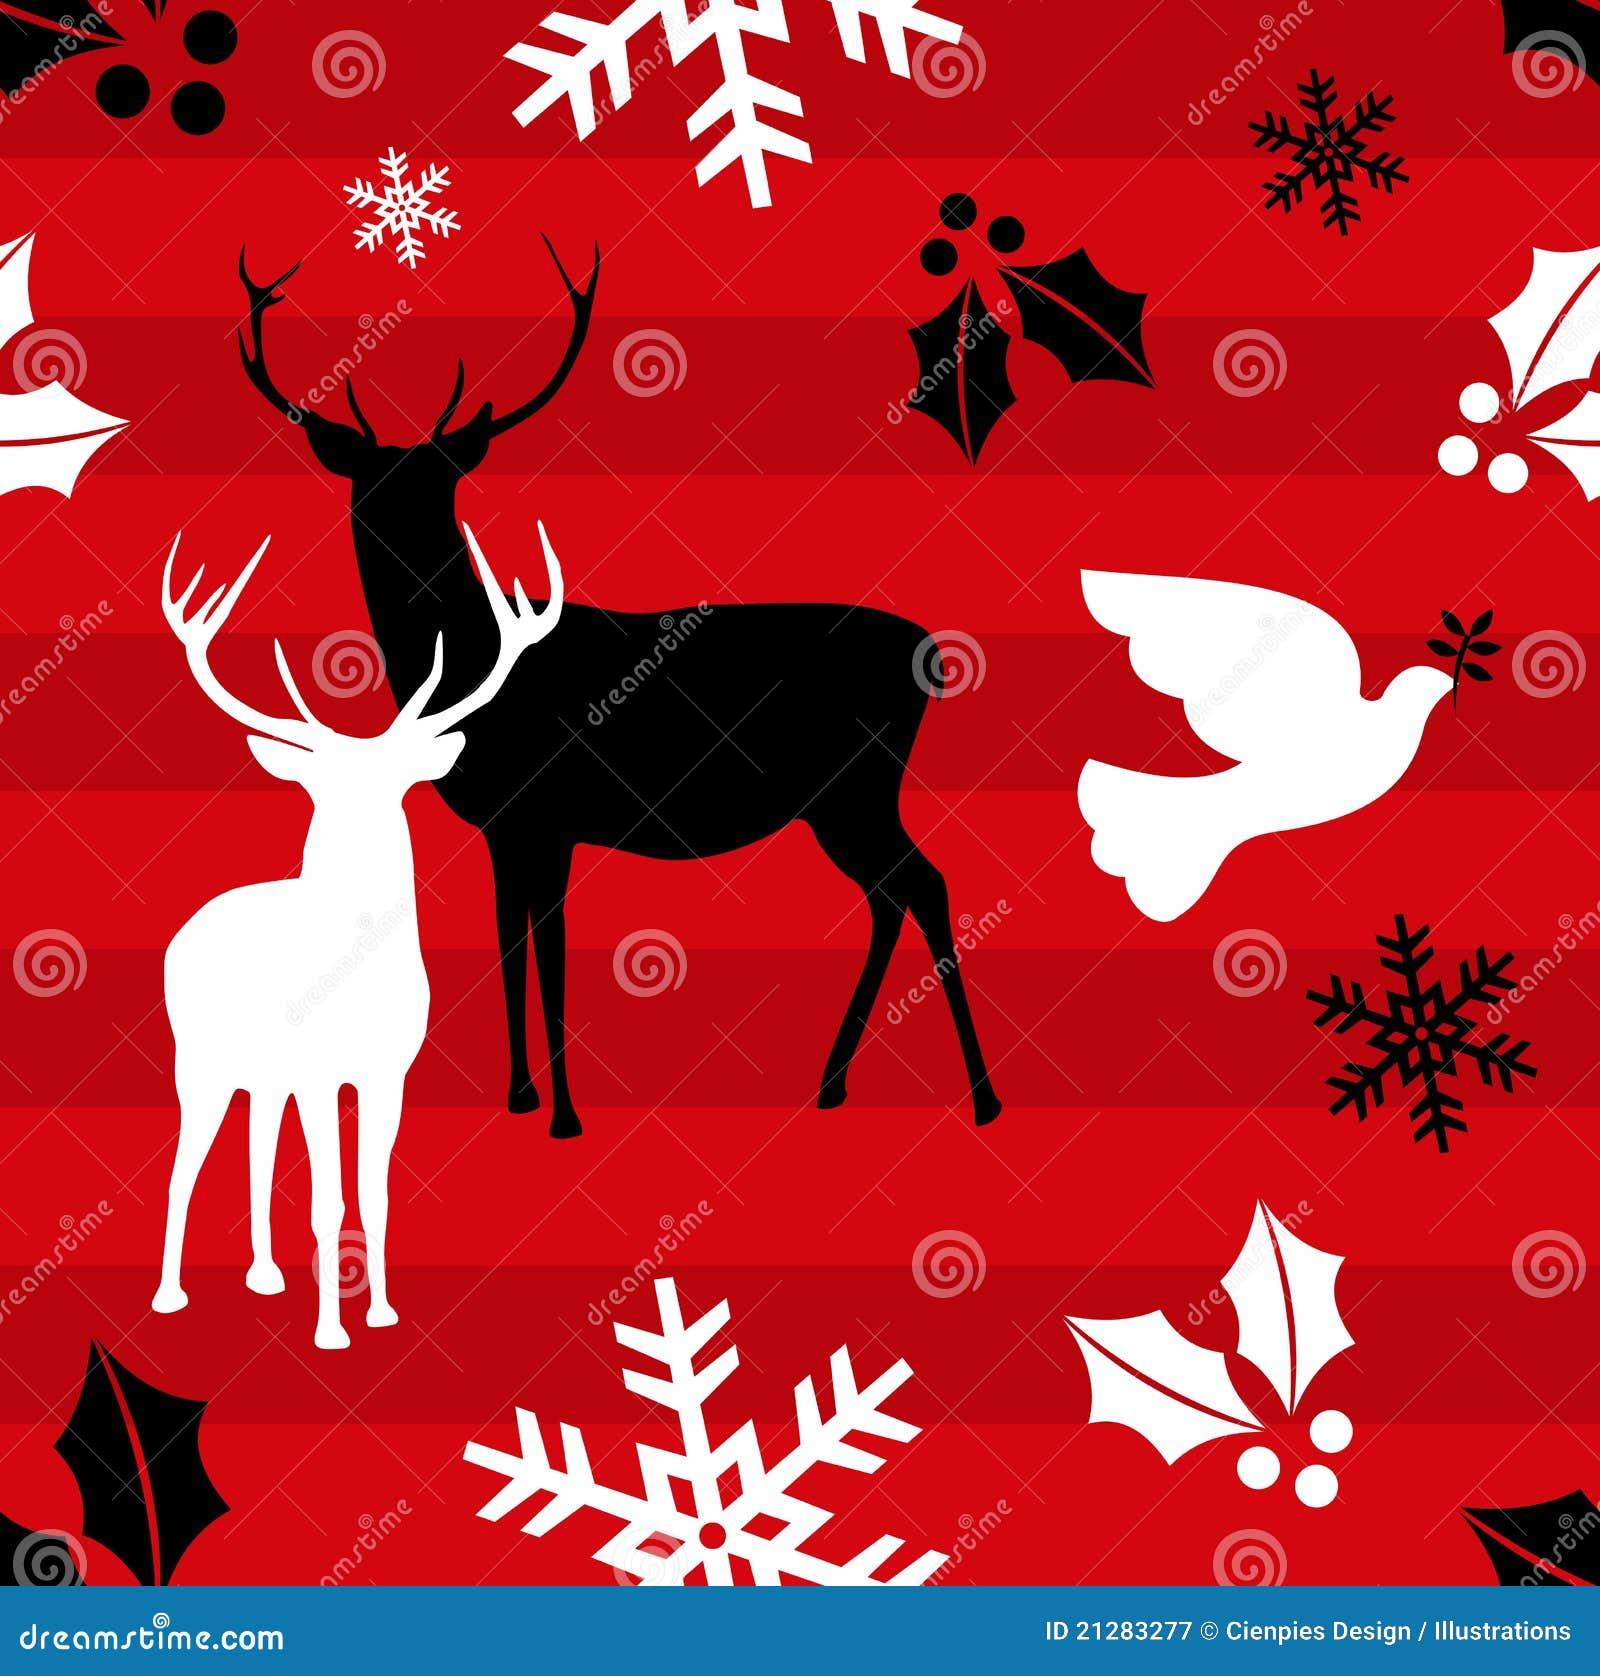 Christmas Reindeer Pattern Background Royalty Free Stock